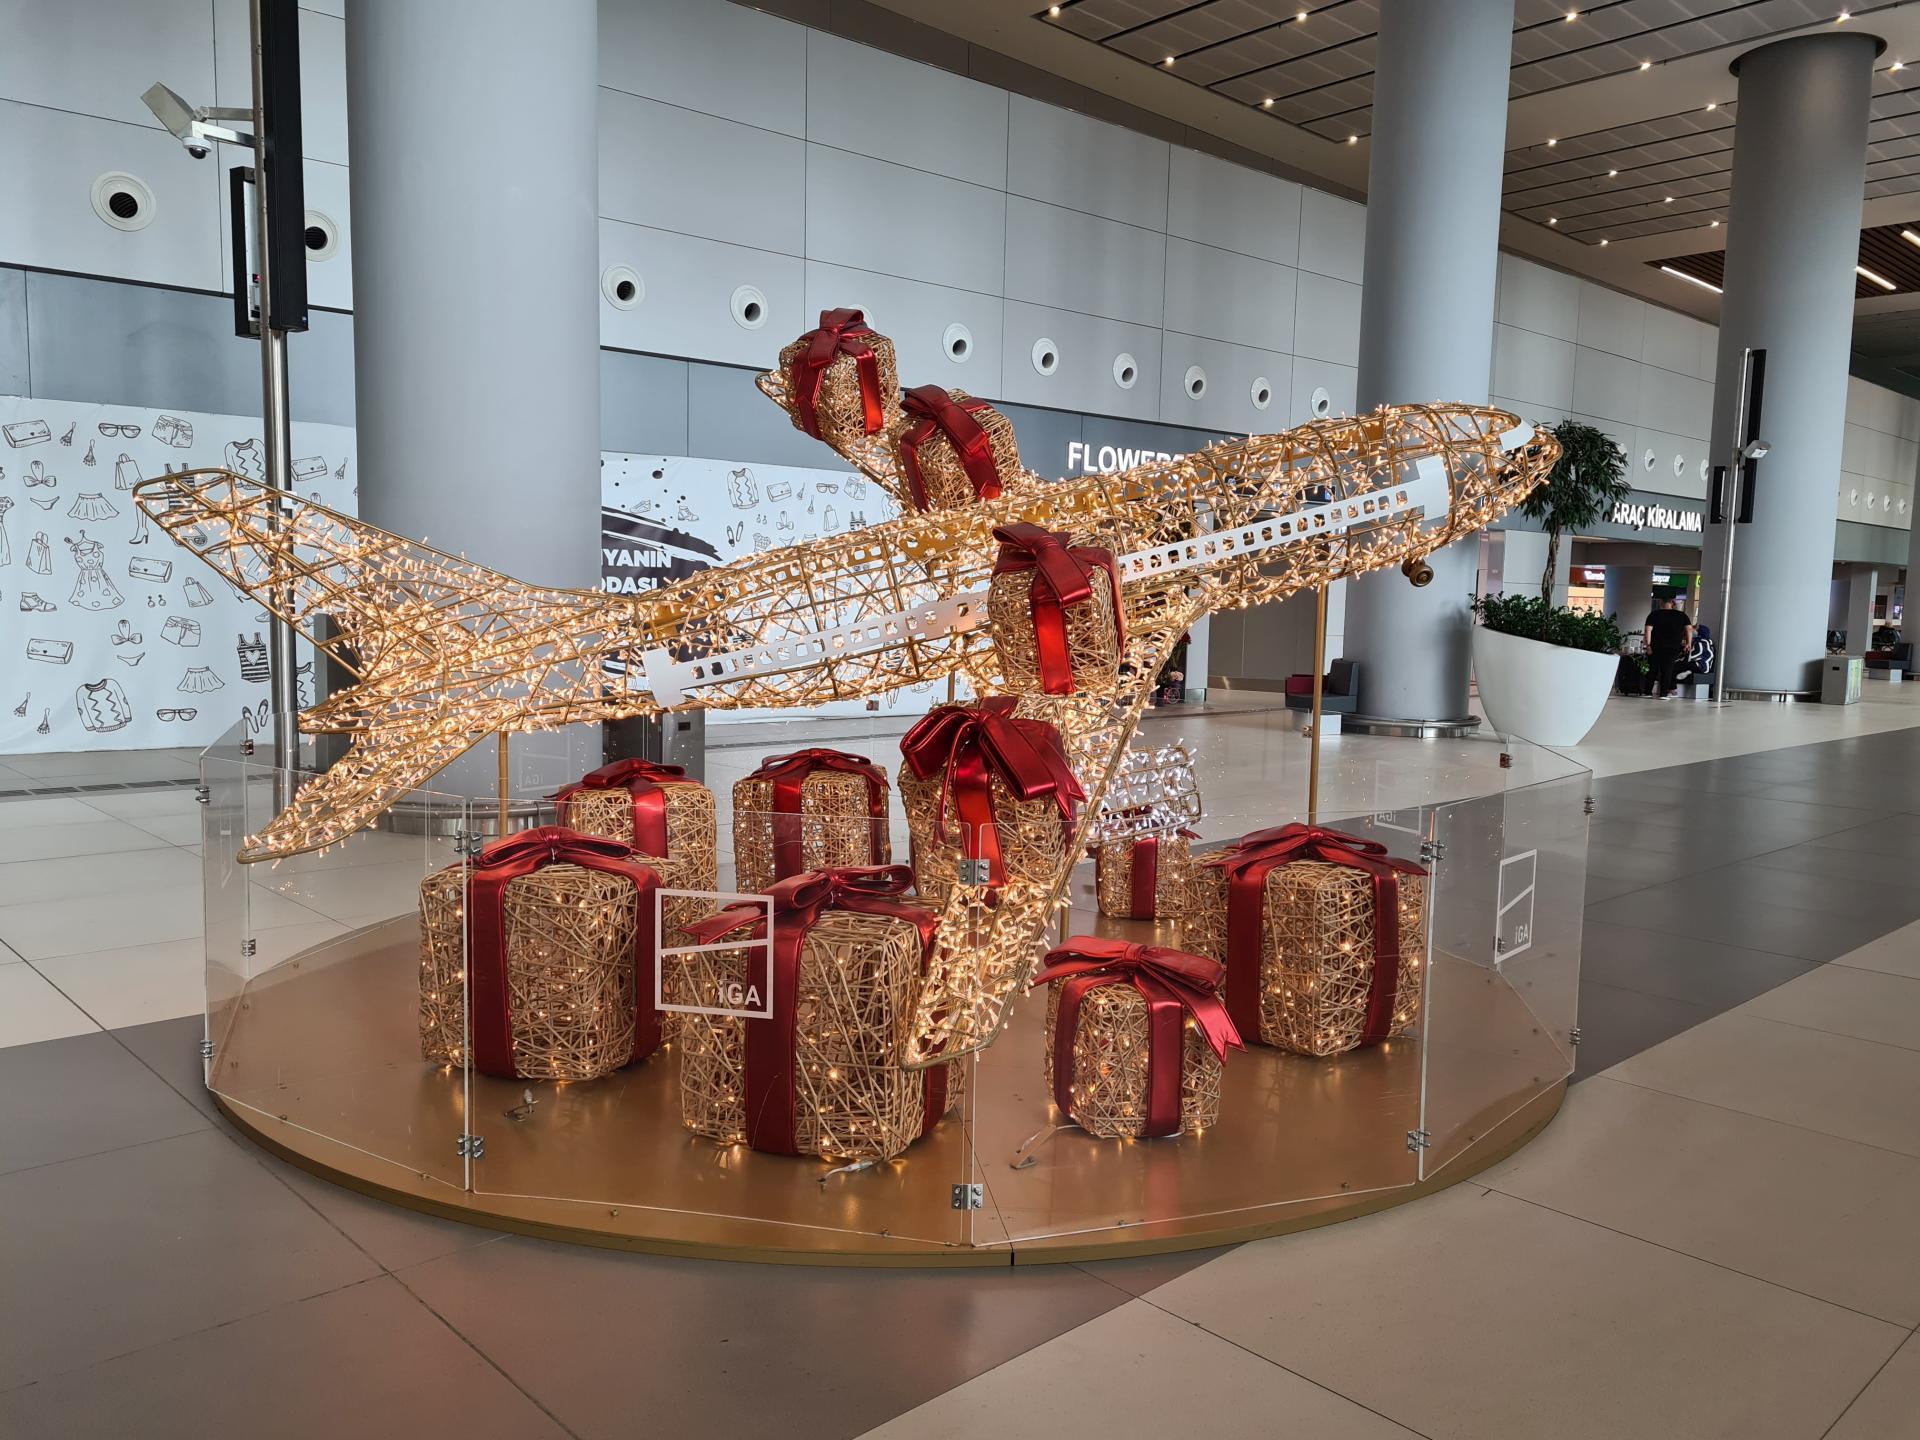 инсталляция в виде самолета в аэропорту Стамбула